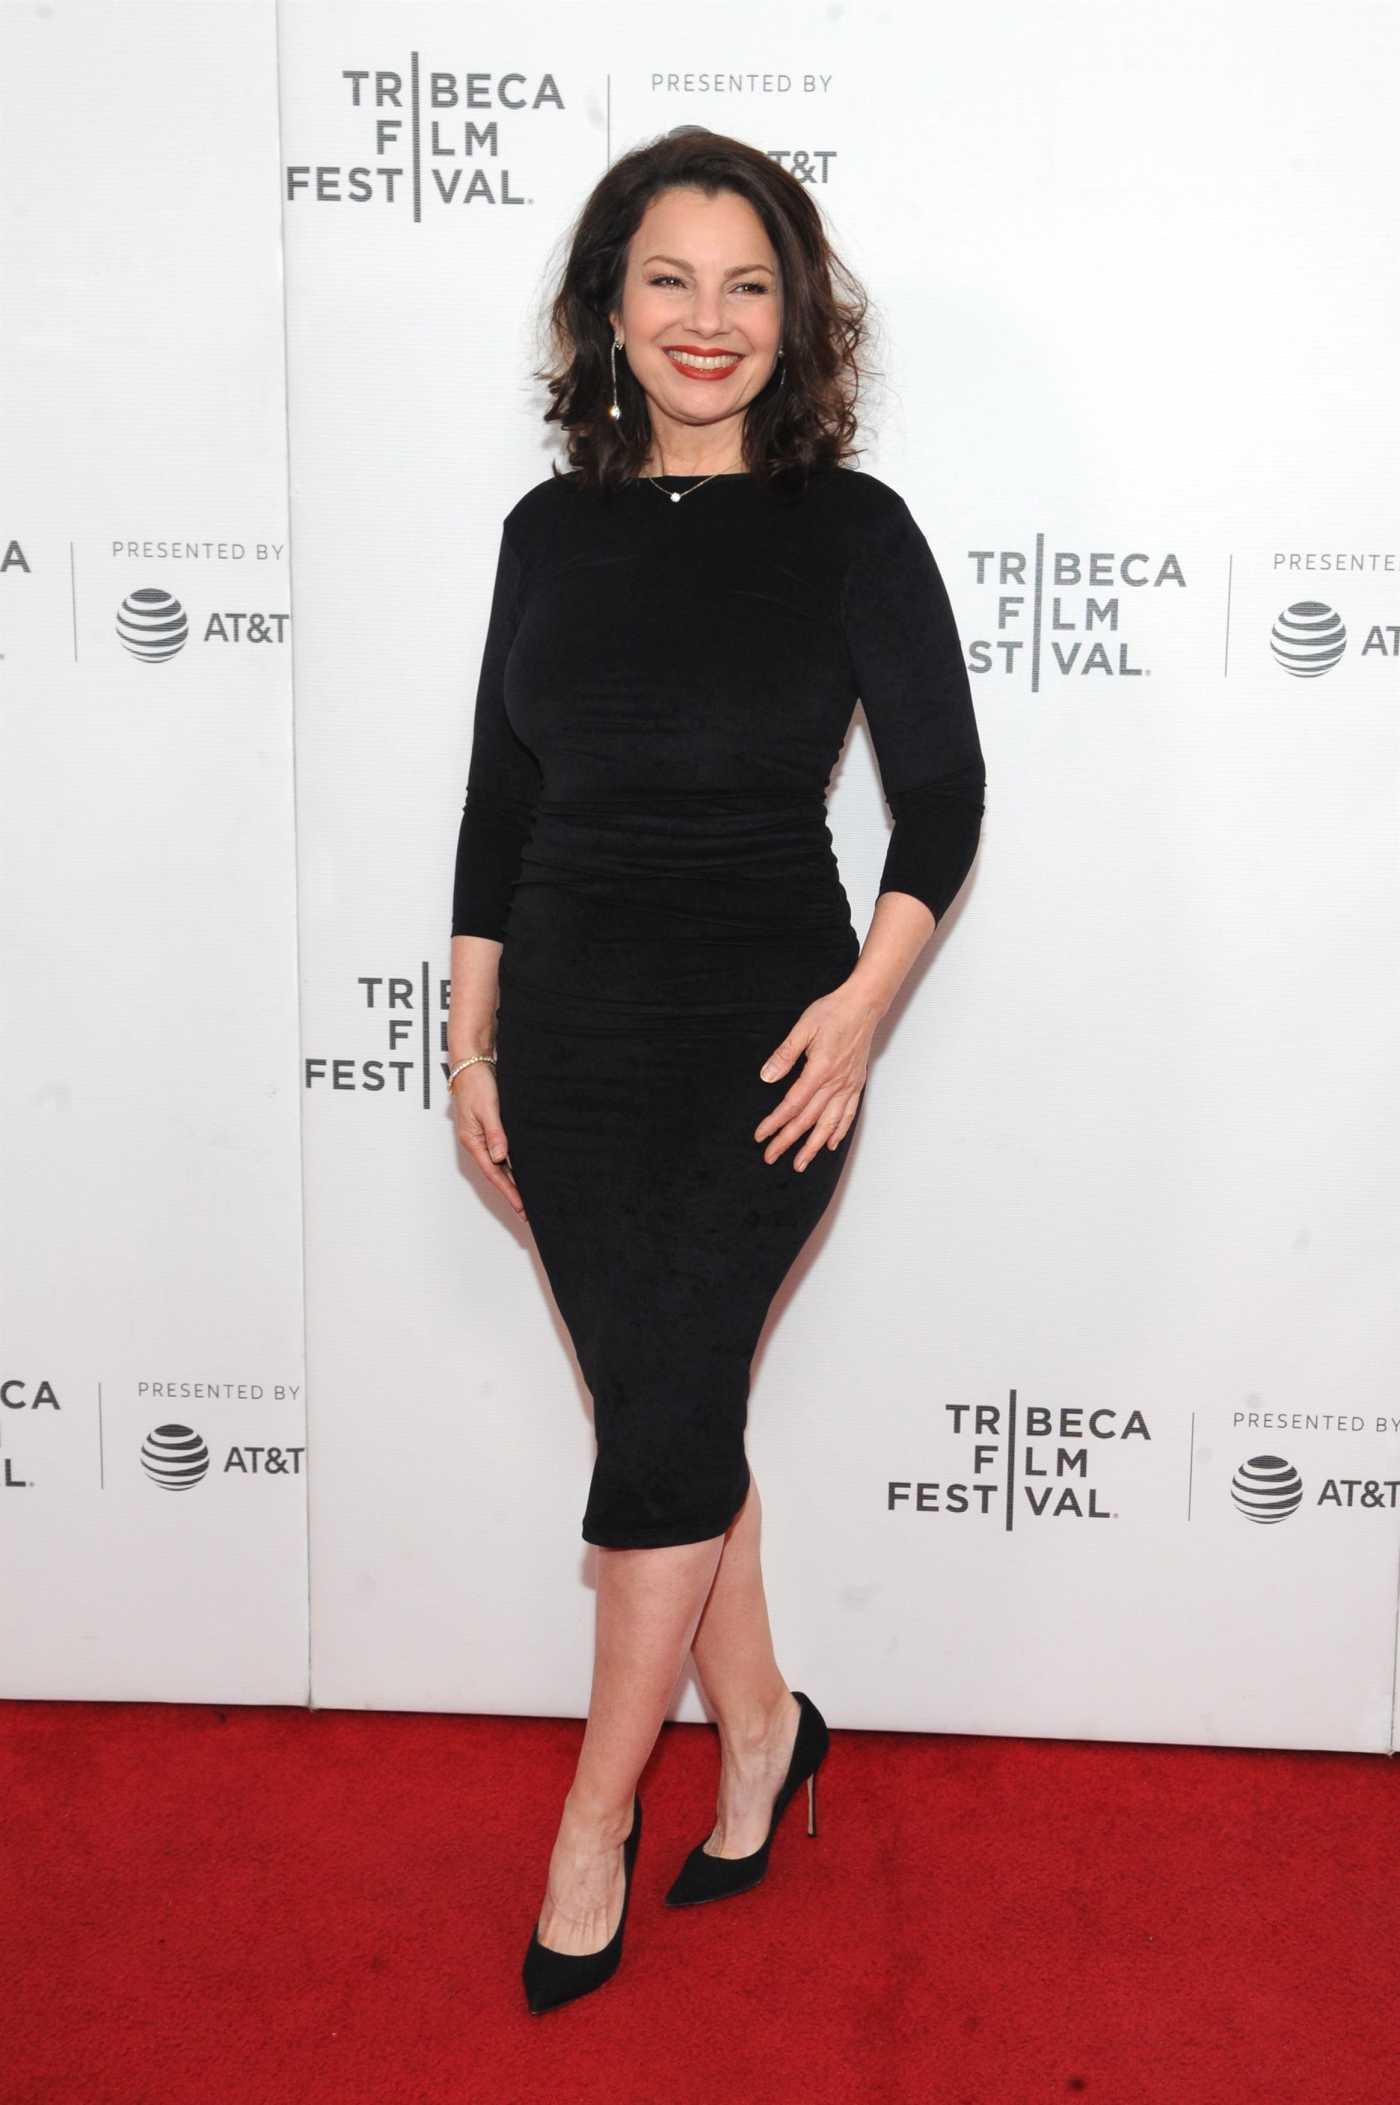 Fran Drescher Attends Safe Spaces Premiere During 2019 Tribeca Film Festiva in New York 04/29/2019